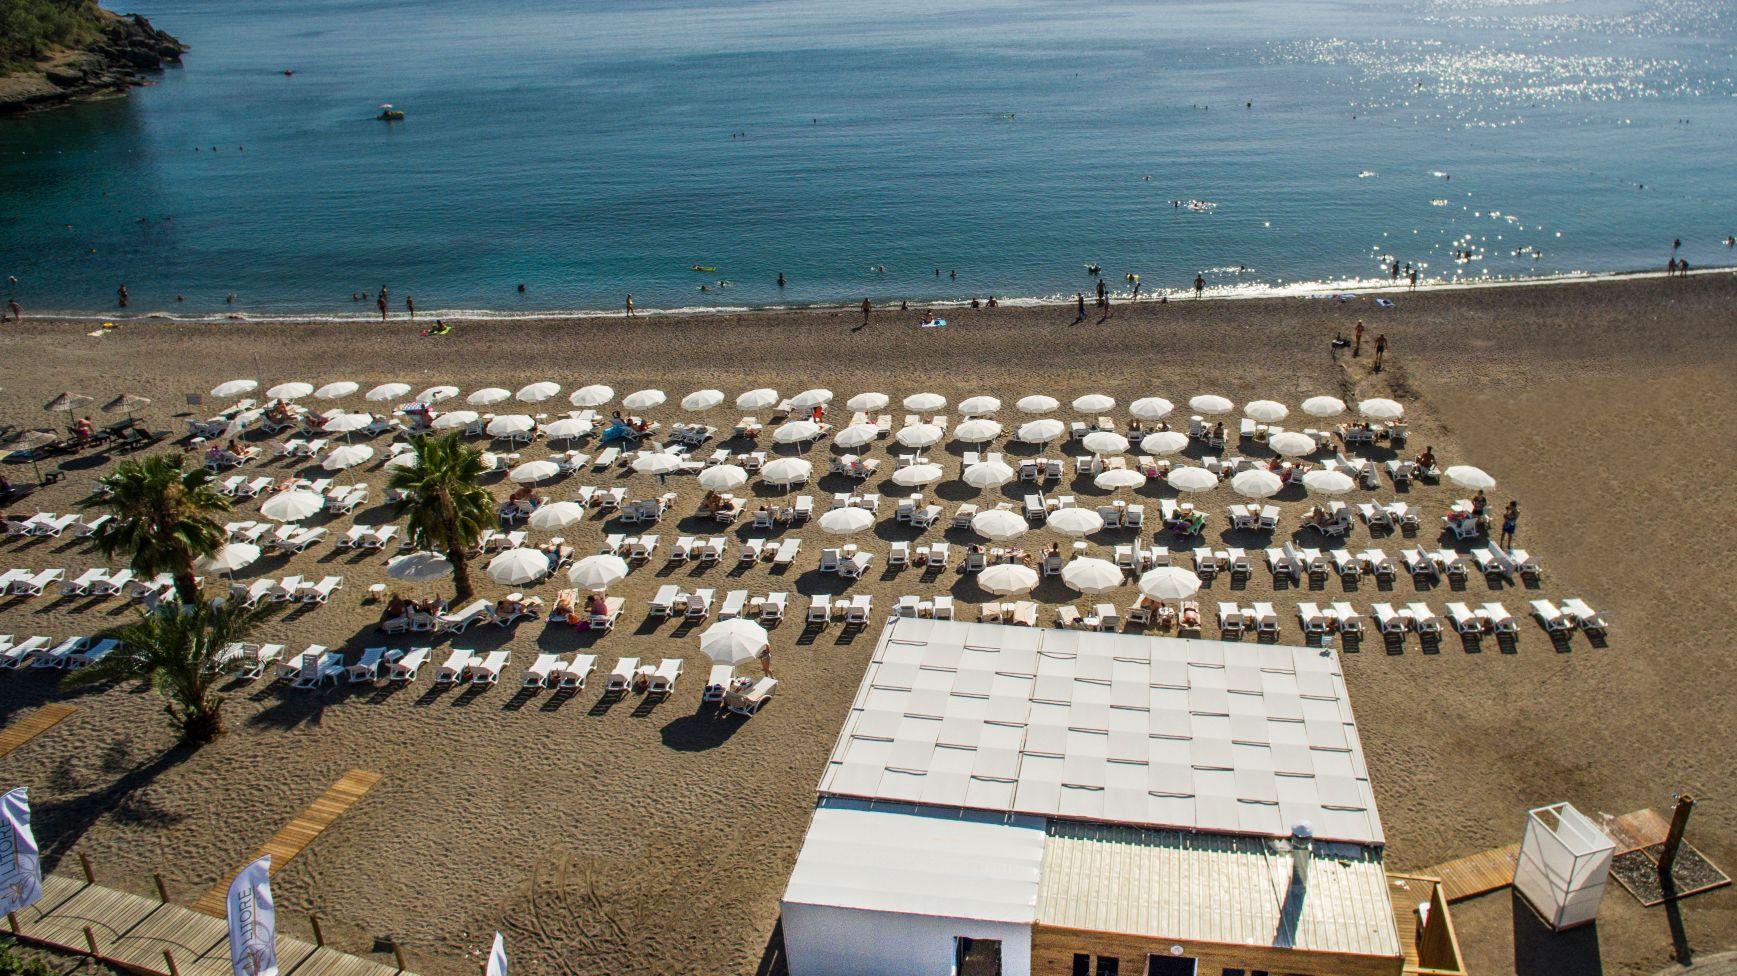 http://www.orextravel.sk/OREX/hotelphotos/laguna-beach-alya-general-005.jpg